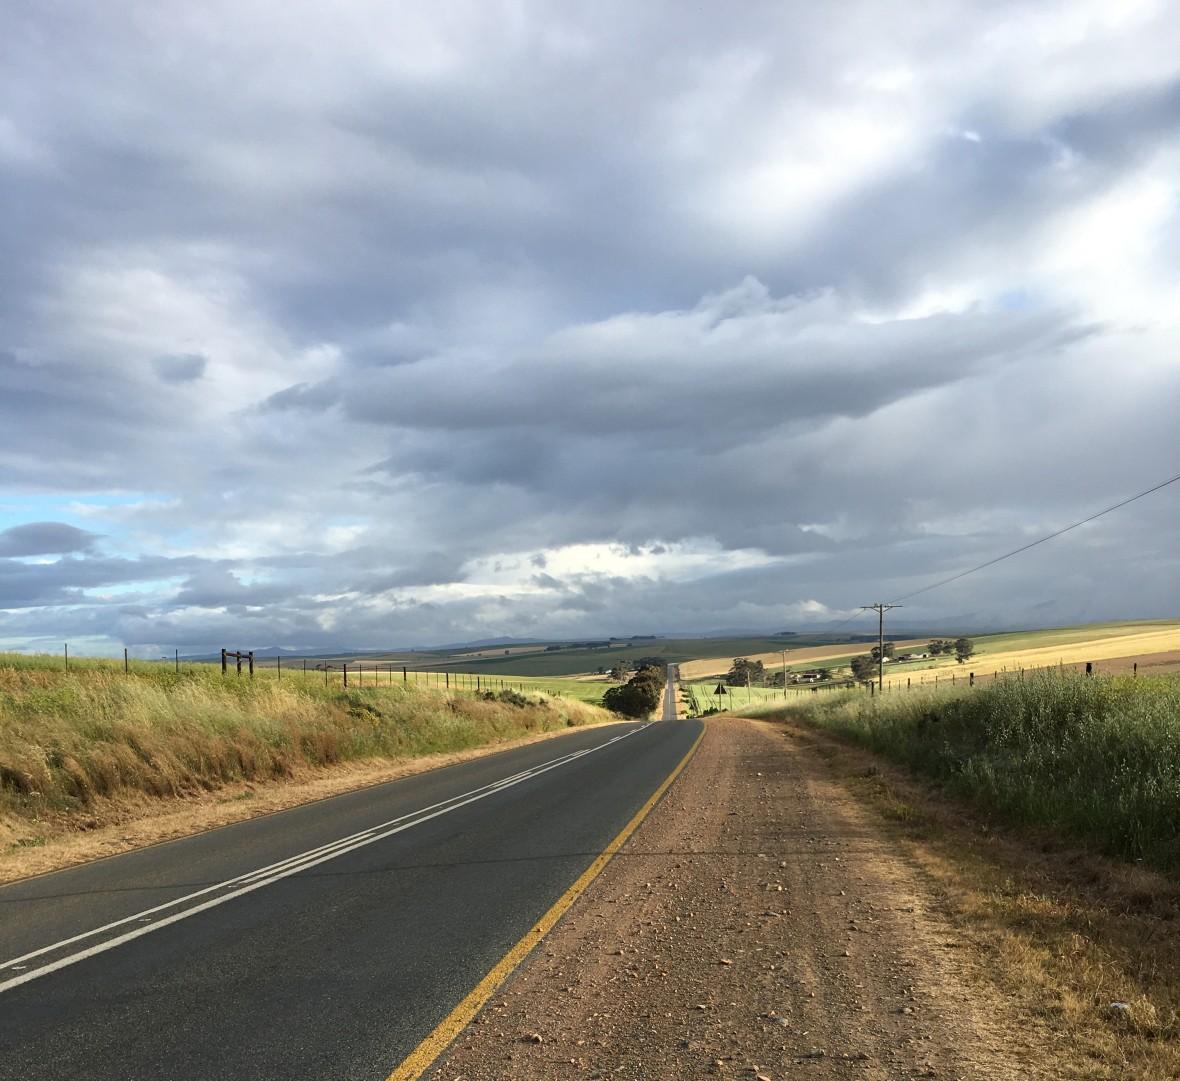 cloudy-garden-route-south-africa